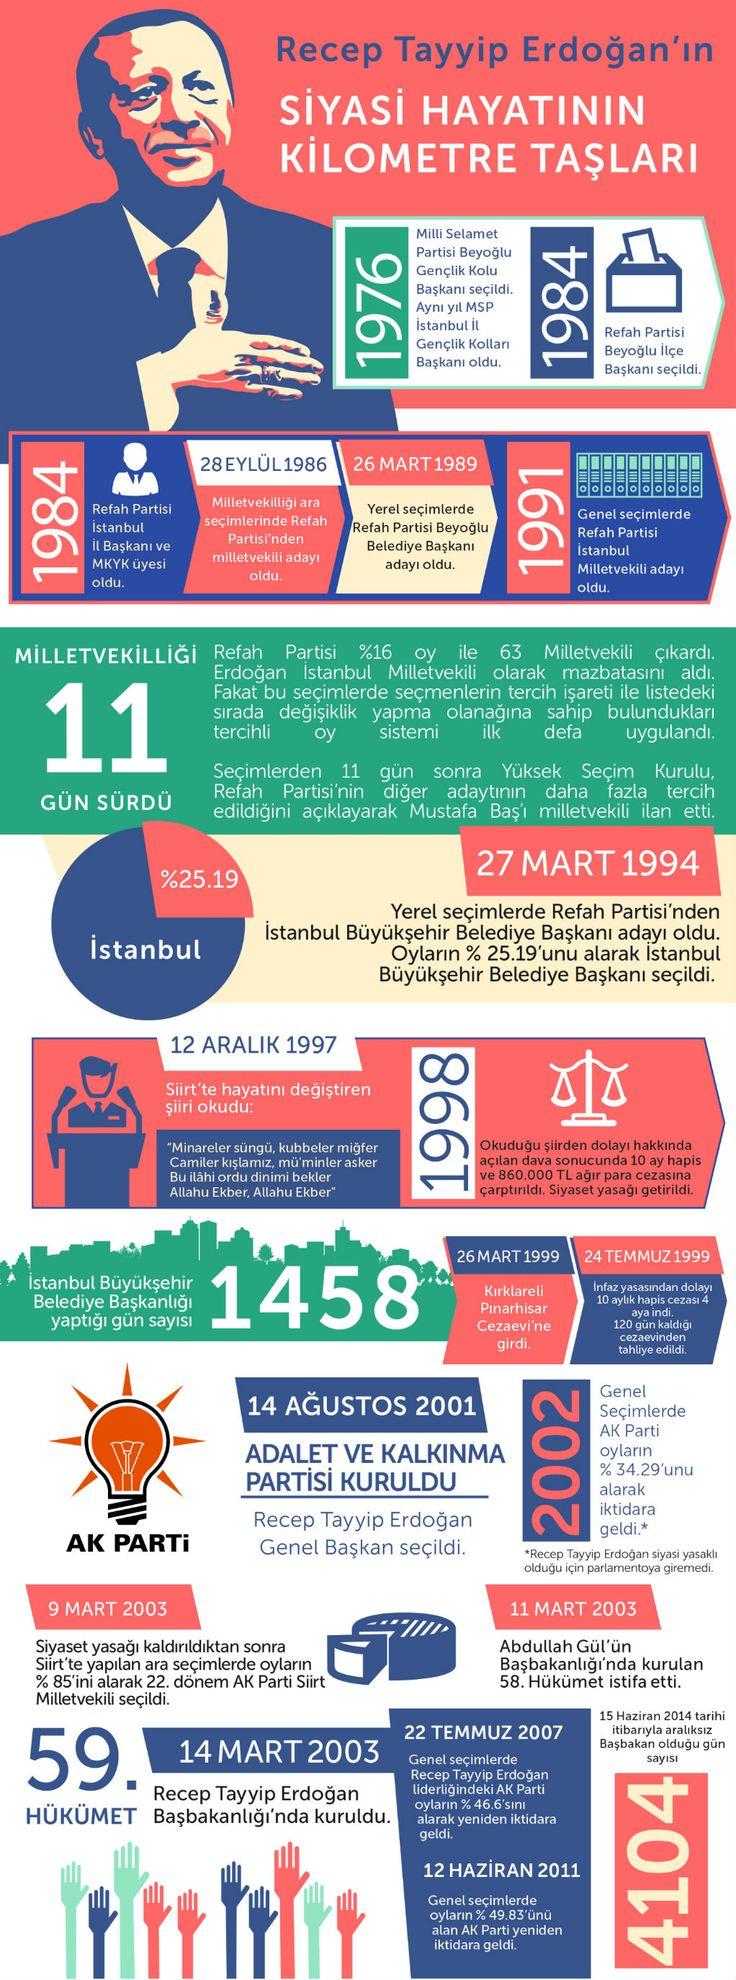 Erdoğan'ın siyasi hayatının kilometre taşları -Cumhurbaşkanlığı Seçimi 2014 #cb2014